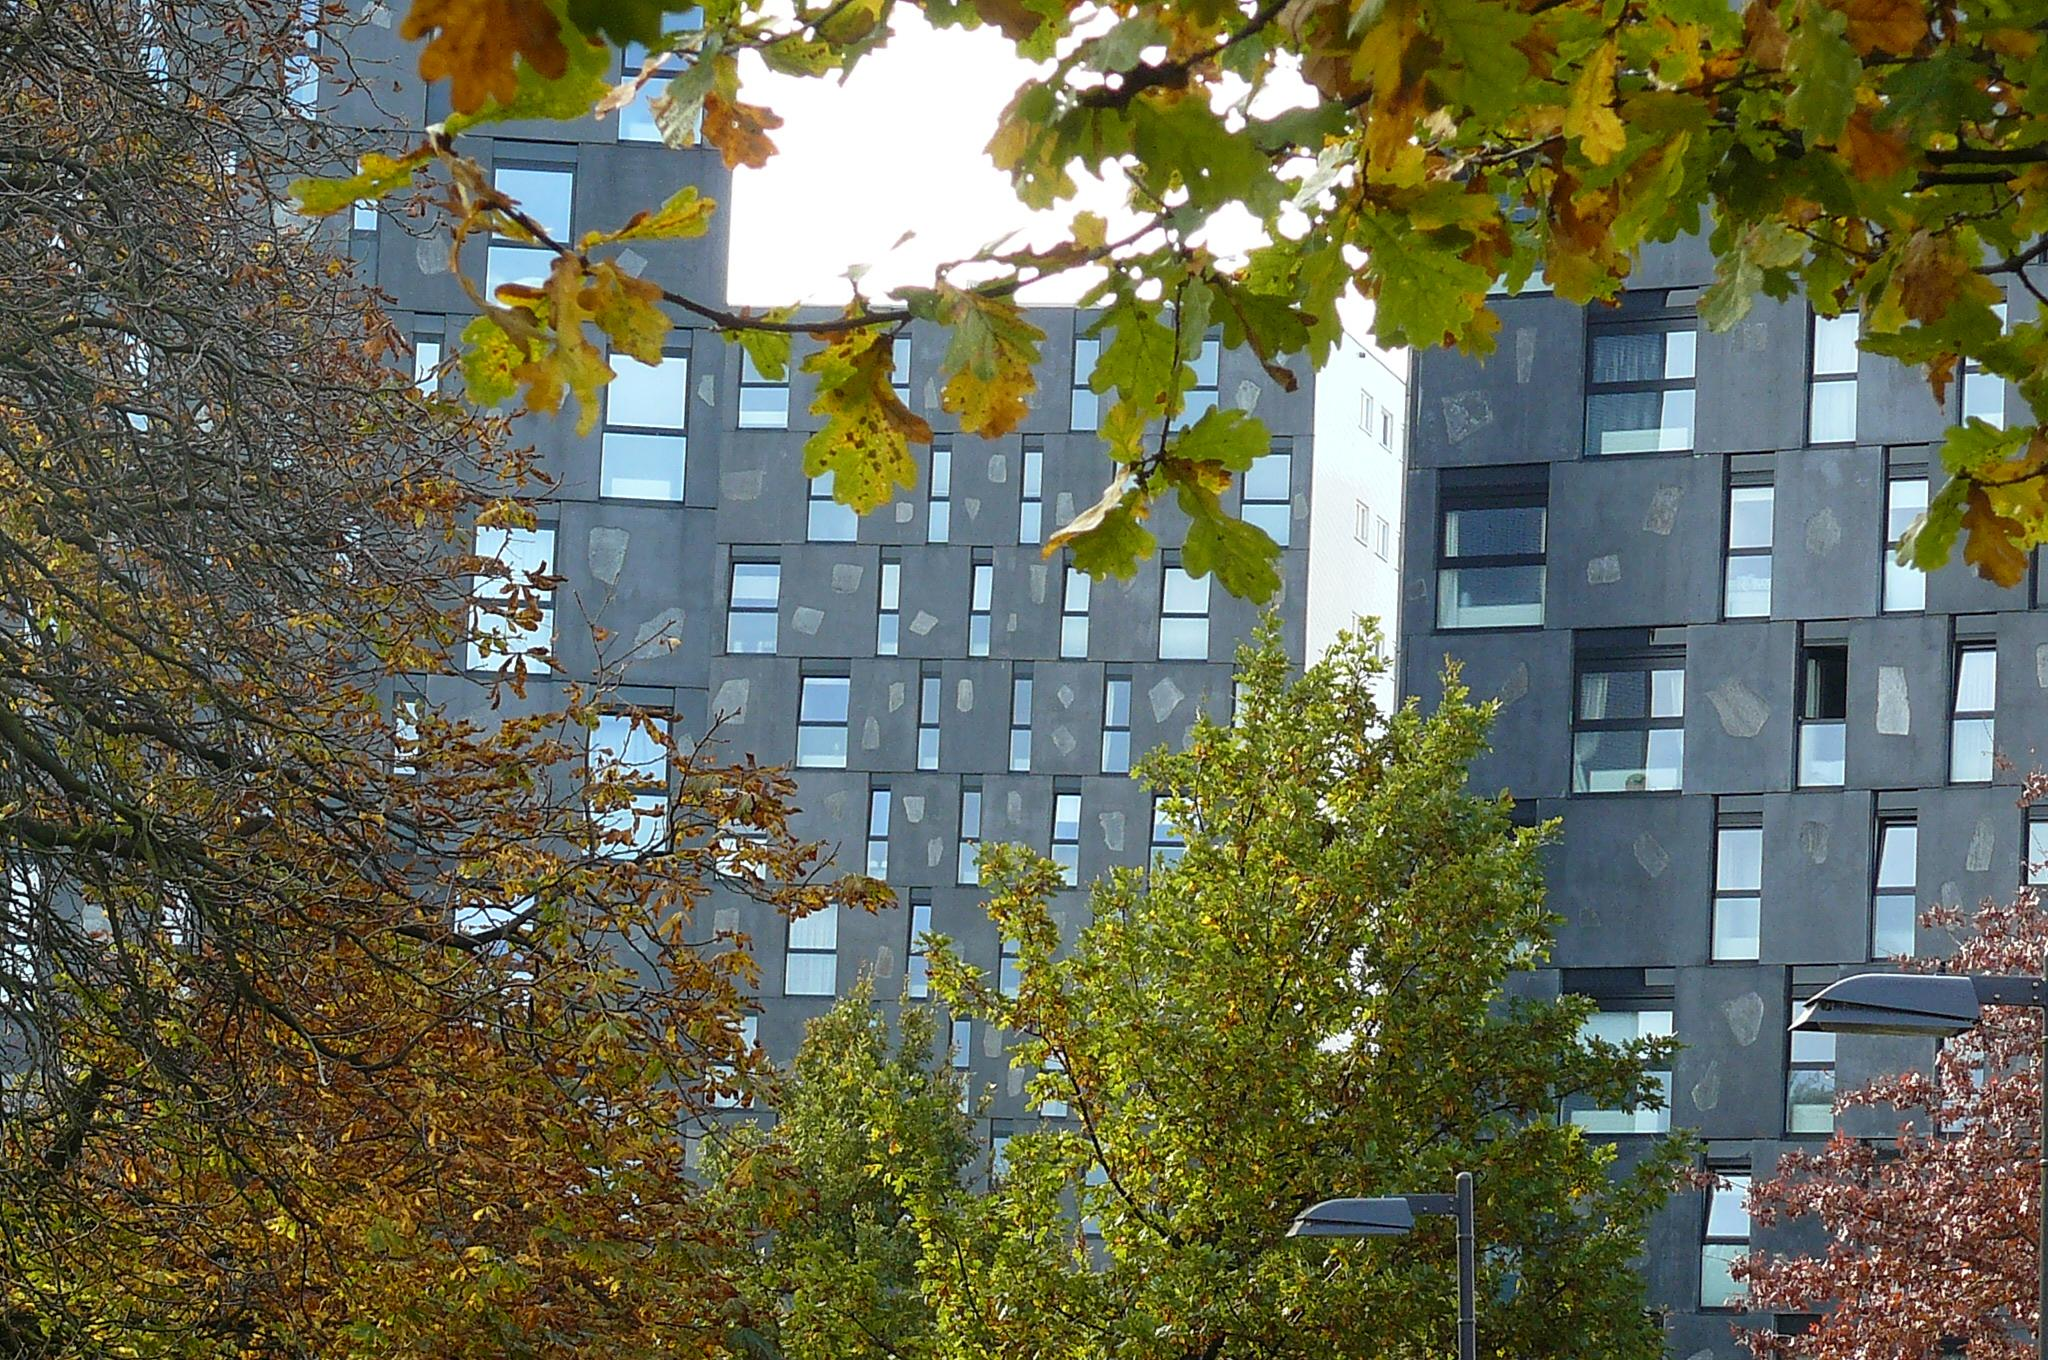 Modern architecture in Breda by yankeebiscuitfan